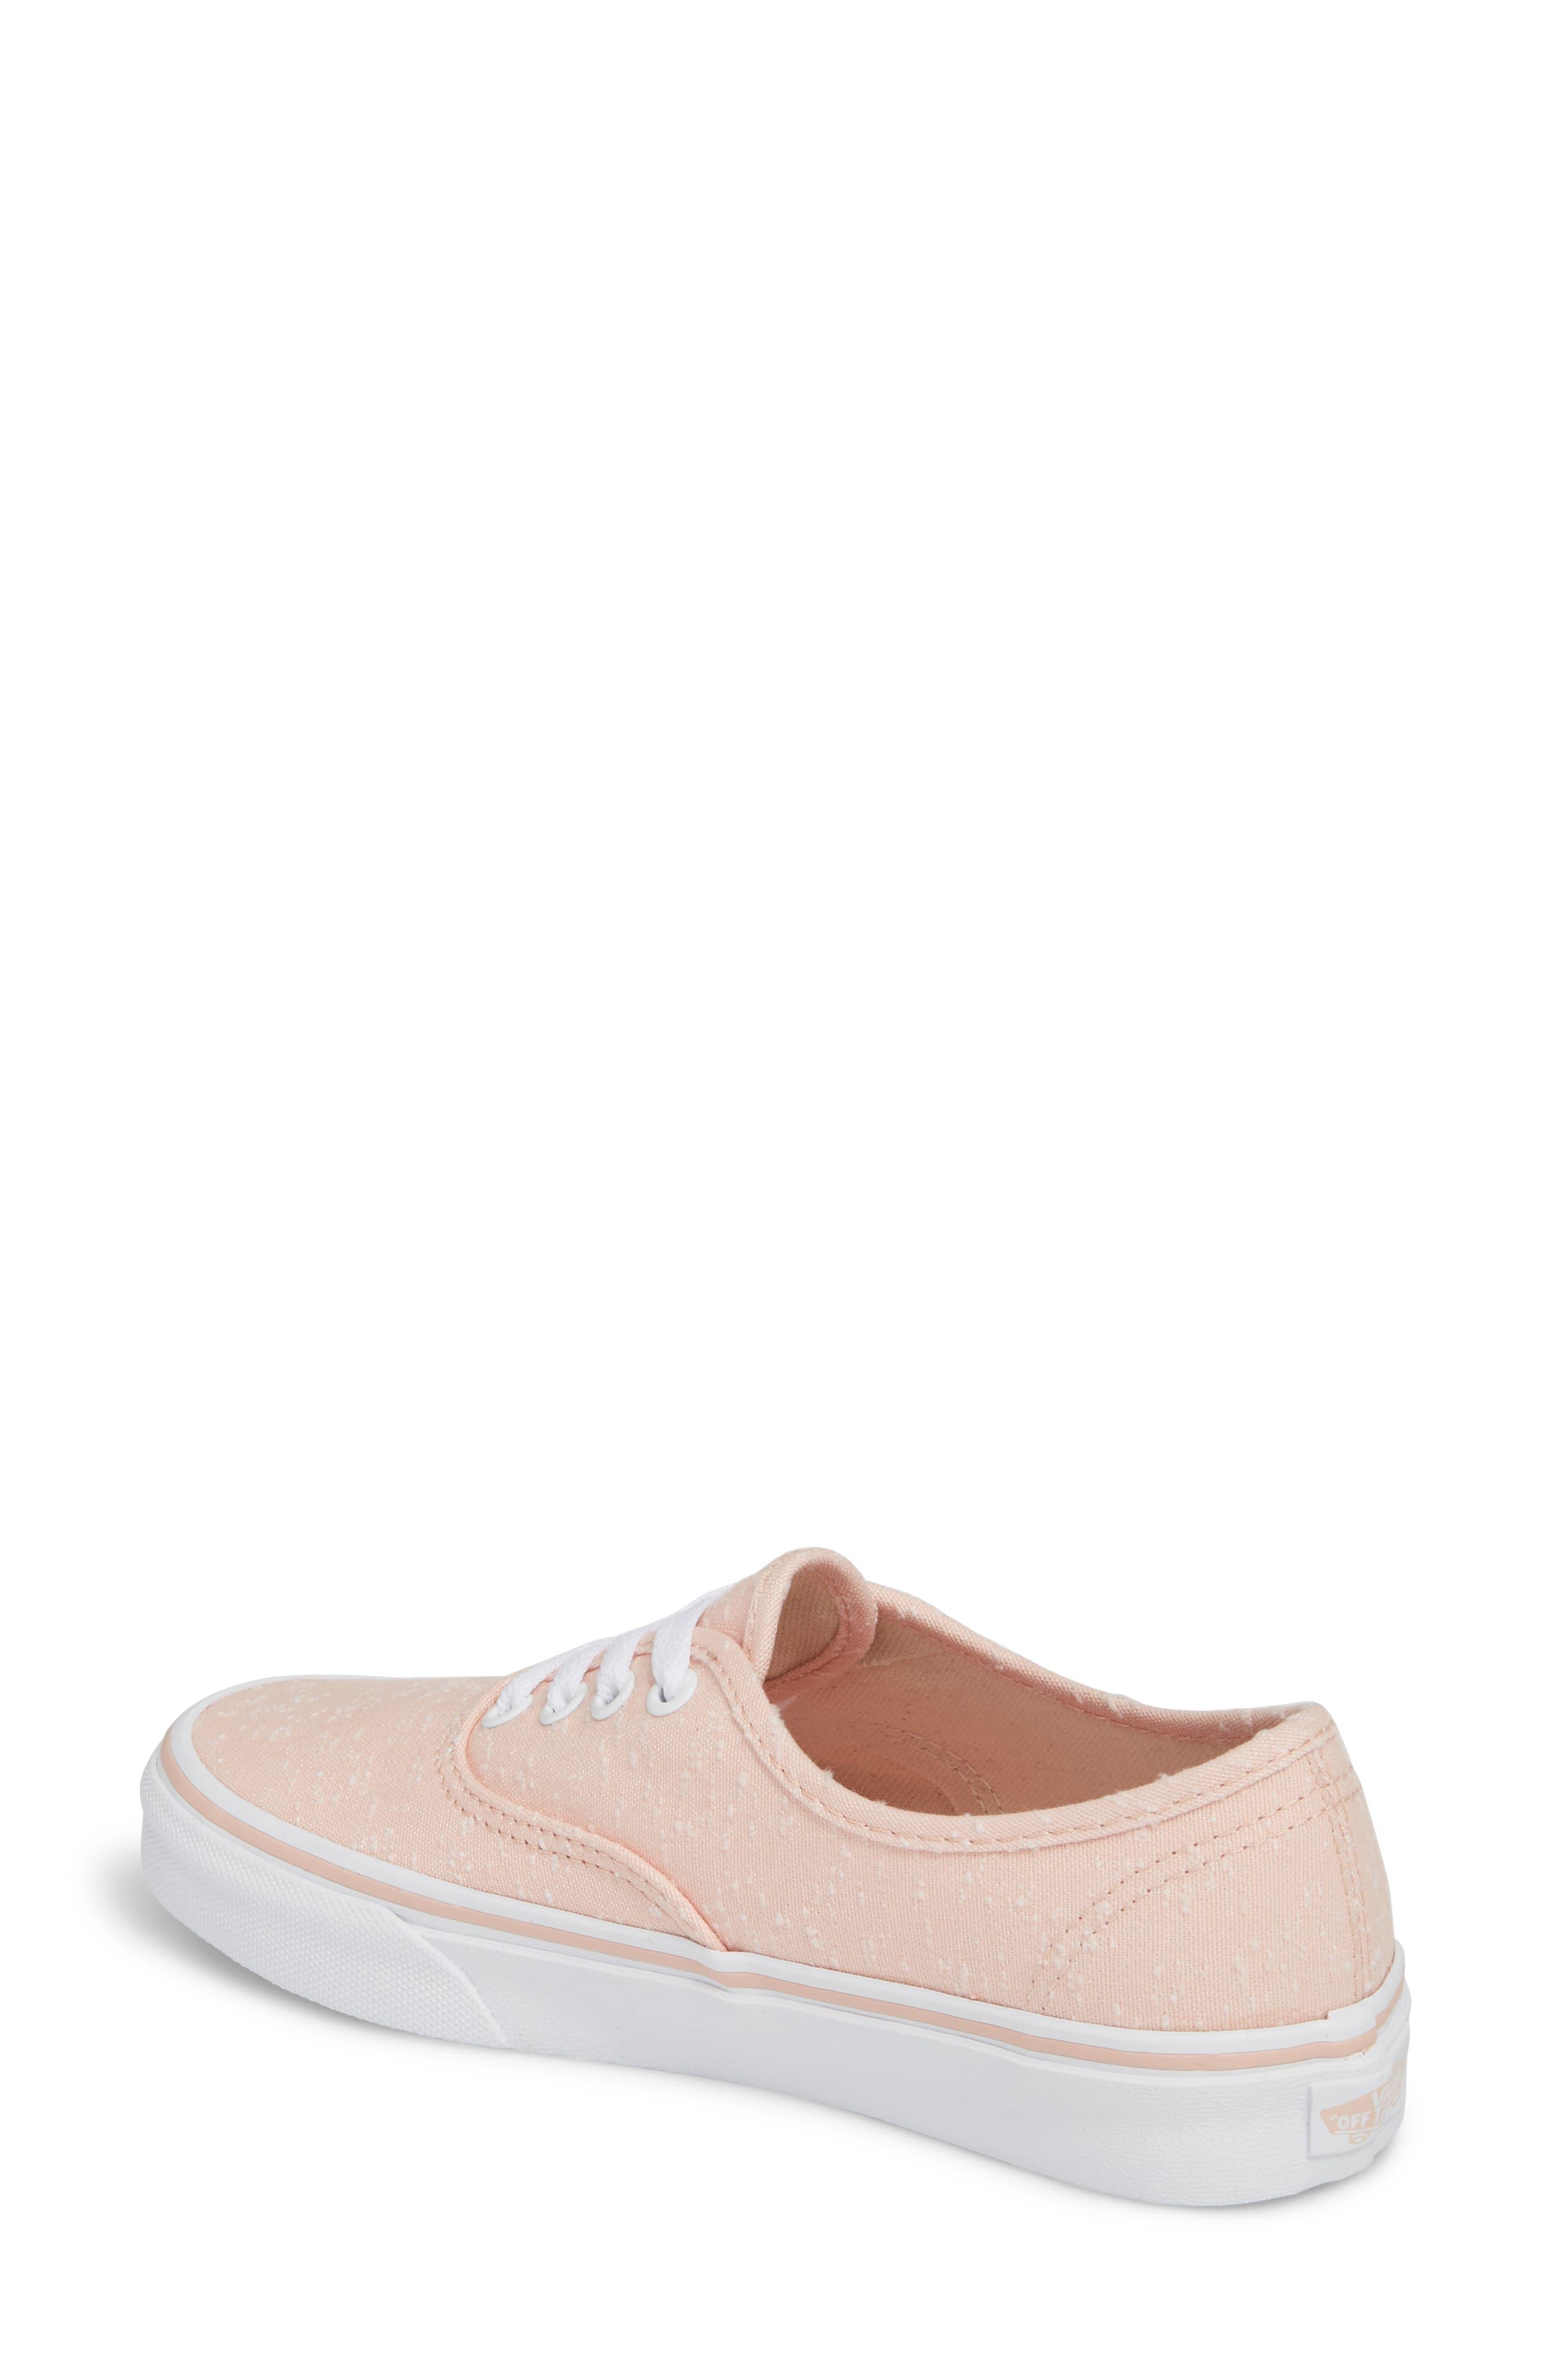 ,                             'Authentic' Sneaker,                             Alternate thumbnail 467, color,                             680